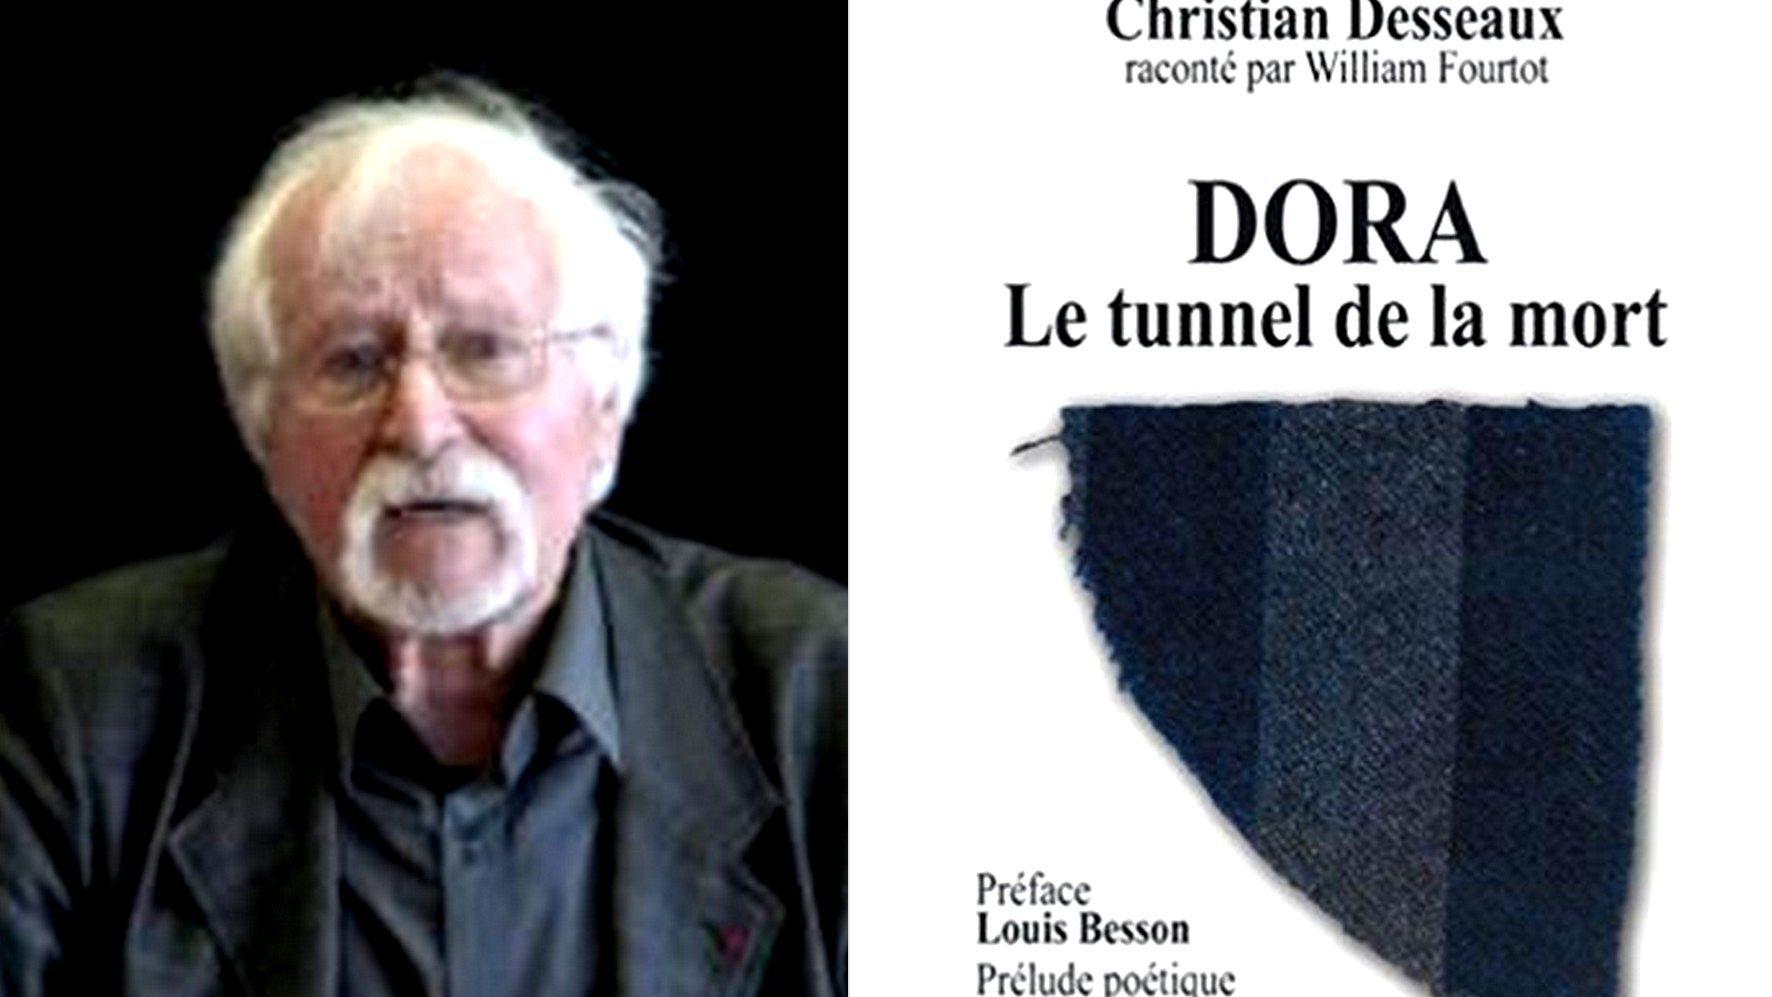 Christian Desseaux Dora.jpg